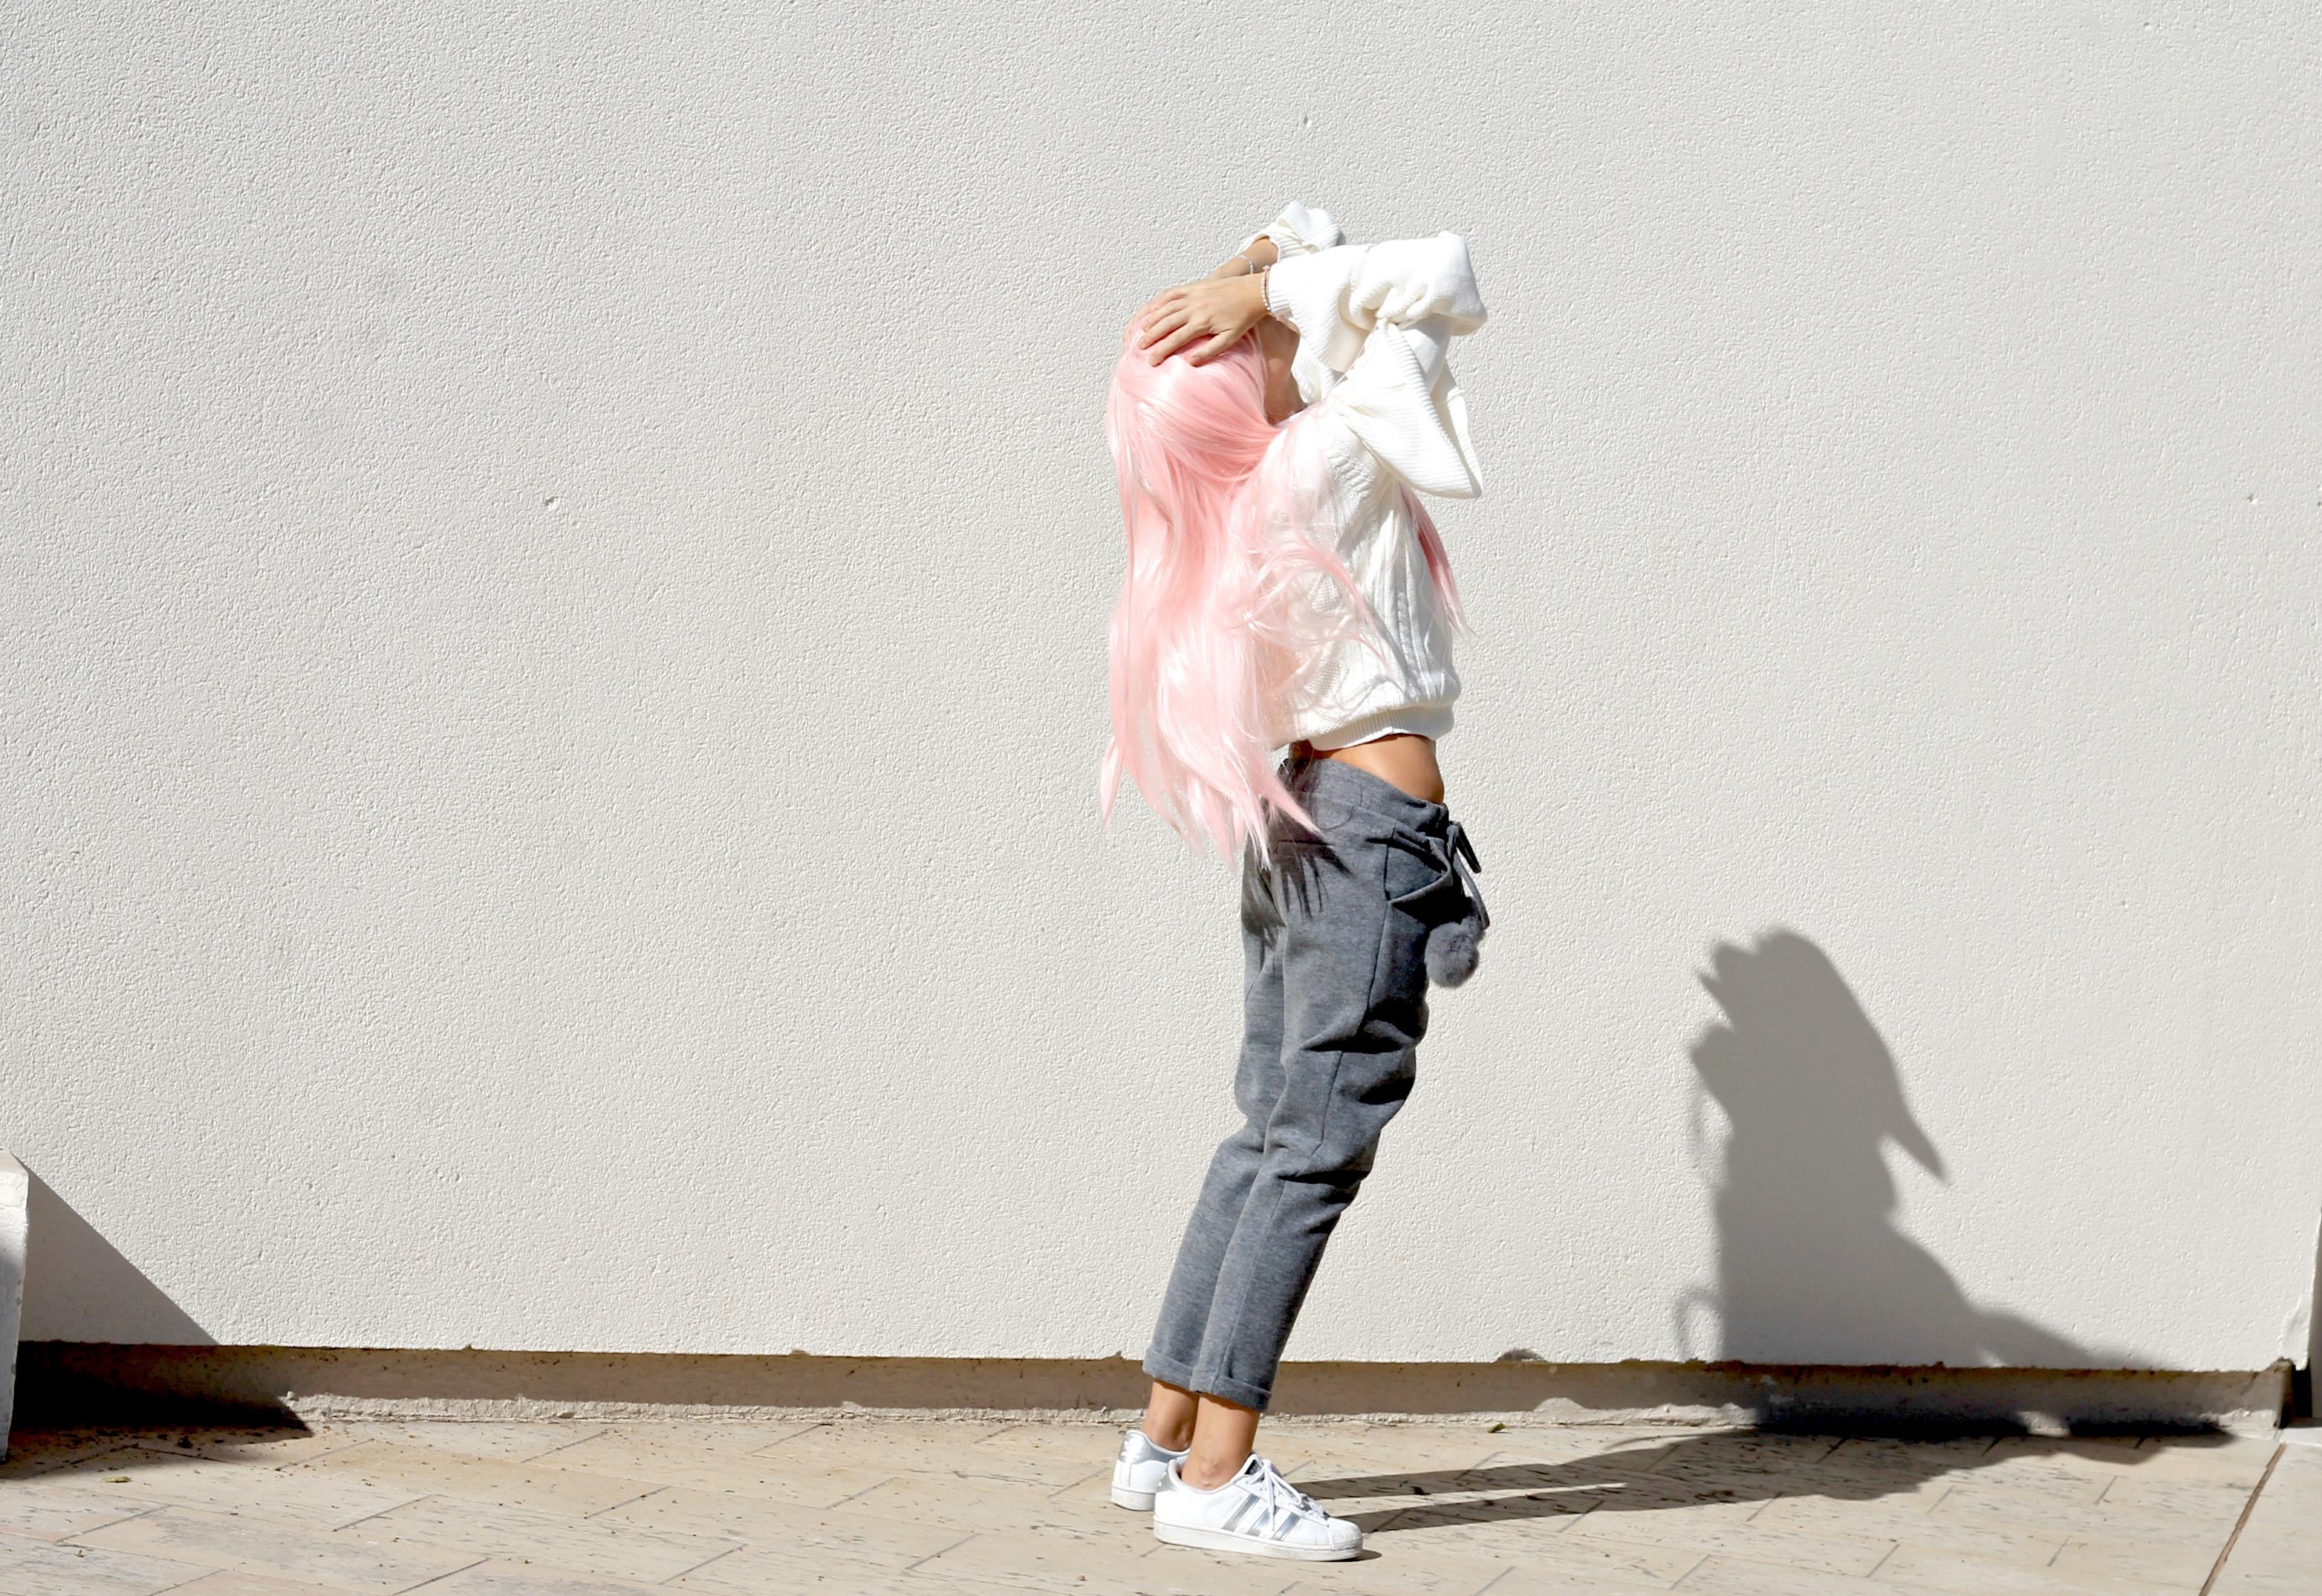 successo fast fashion, manga style blogger, capelli rosa blogger moda, casual chic look autunno inverno 2016, casual chic outfit blogger fall winter 2016, theladycracy.it, elisa bellino, fashion blogger instagram 2016, fashion blogger famose 2016, fashion italiane famose 2016, fashion blogger più seguite 2016, fashion blog 2016, fashion blogger italia 2016, fashion blogger outfit autunno inverno 2016, fashion blogger milano 2016, i love friday outfit, i love friday clothes, sporty chic outfit fall winter 2016, sporty chic look fall 2016, sporty chic blogger 2016,